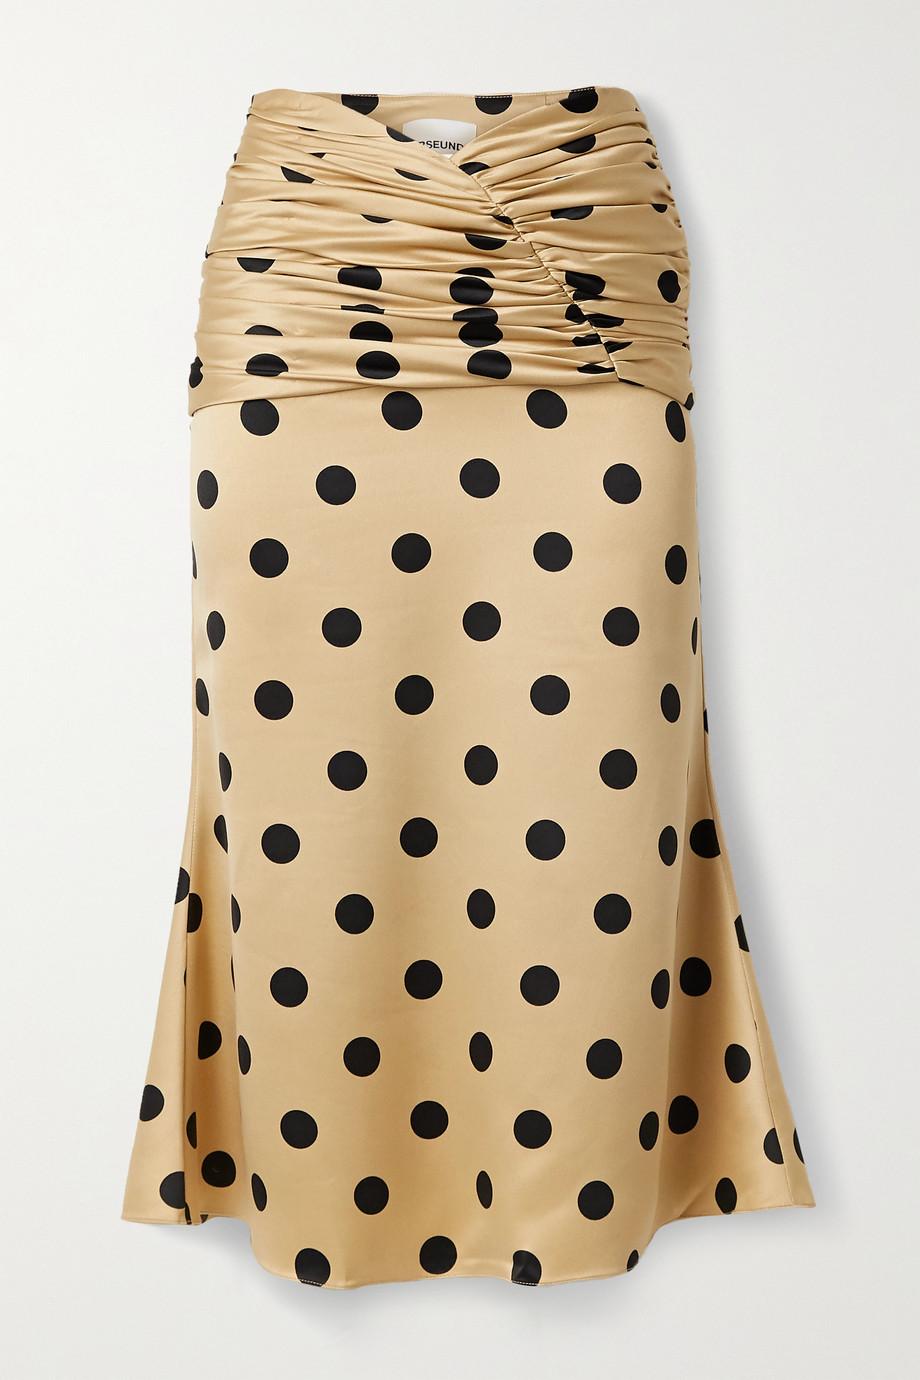 Orseund Iris Romantique ruched polka-dot satin skirt